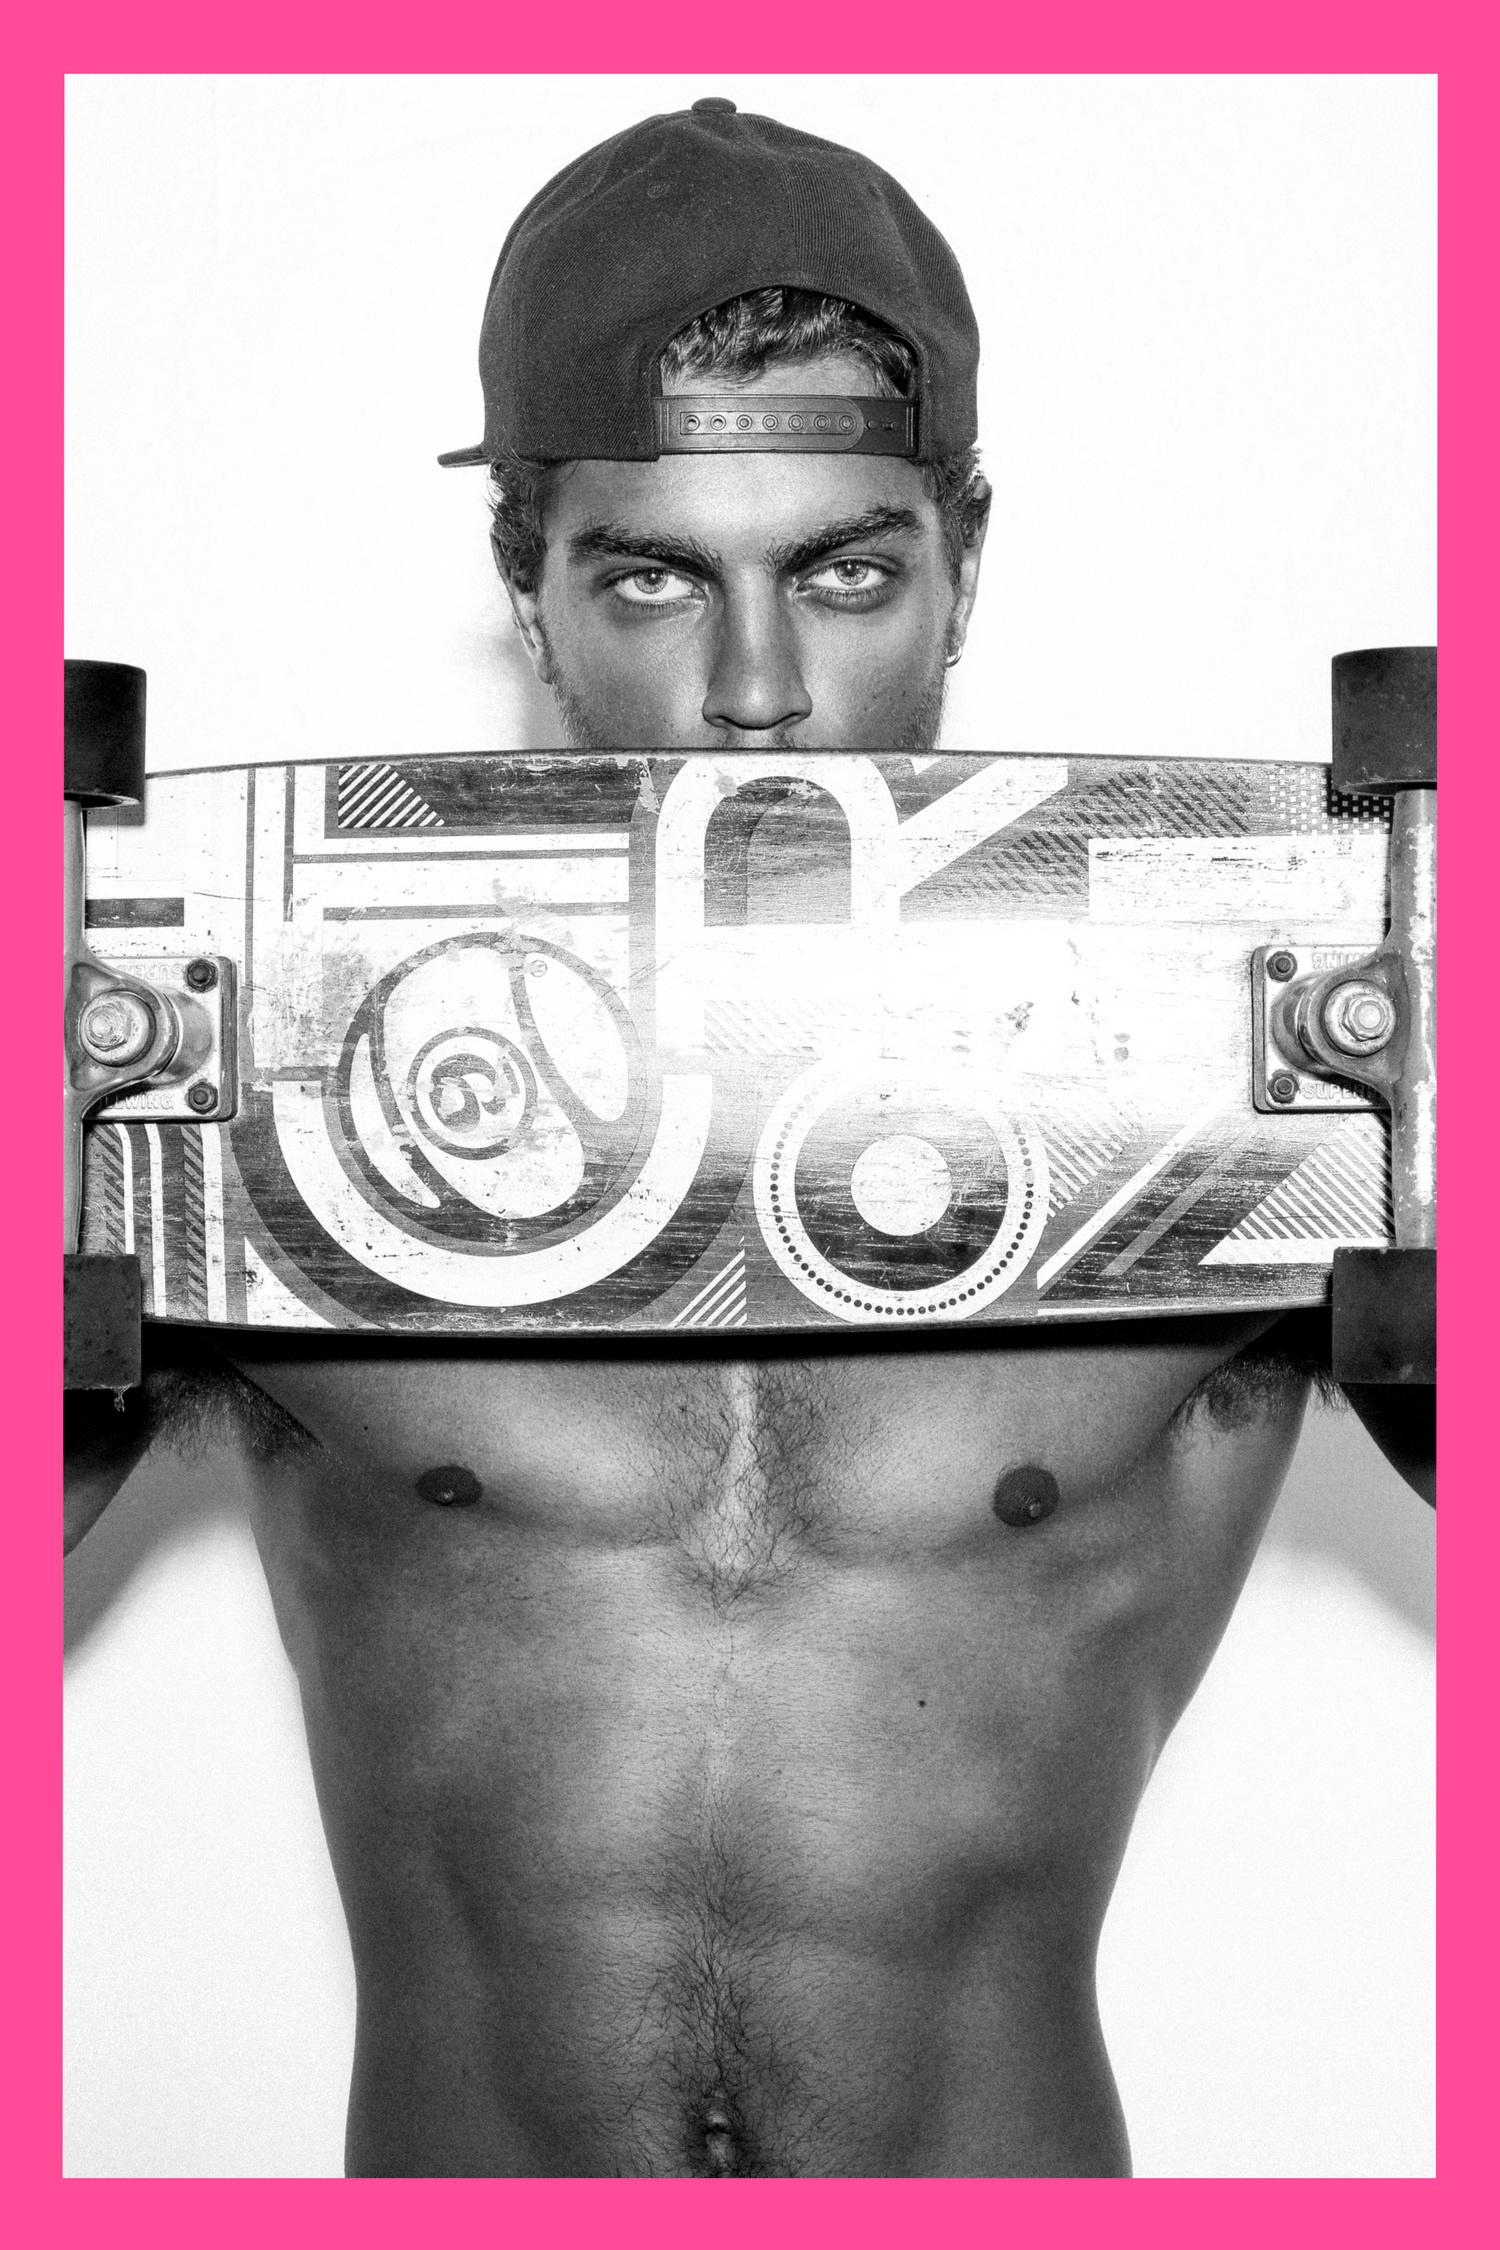 Adon Exclusive: Models Tim Adam and Matt Young By Blake Ballard